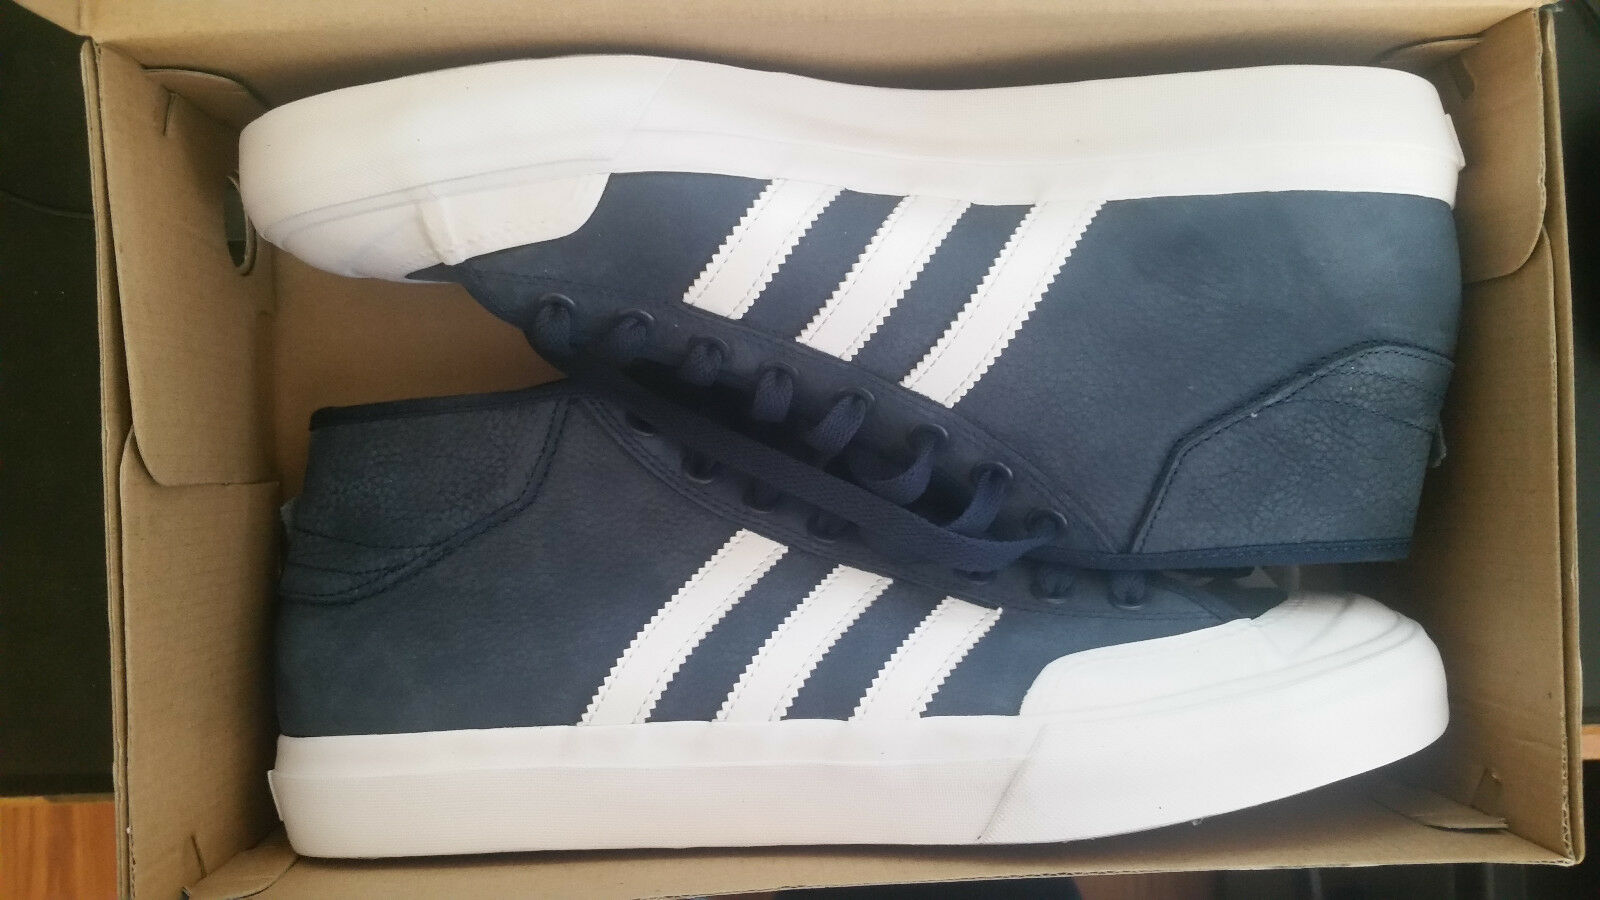 2c442677f042 Adidas Men s Matchcourt Mid Fashion Sneaker MEN SHOES NAVY WHITE BY3203  SIZE 10